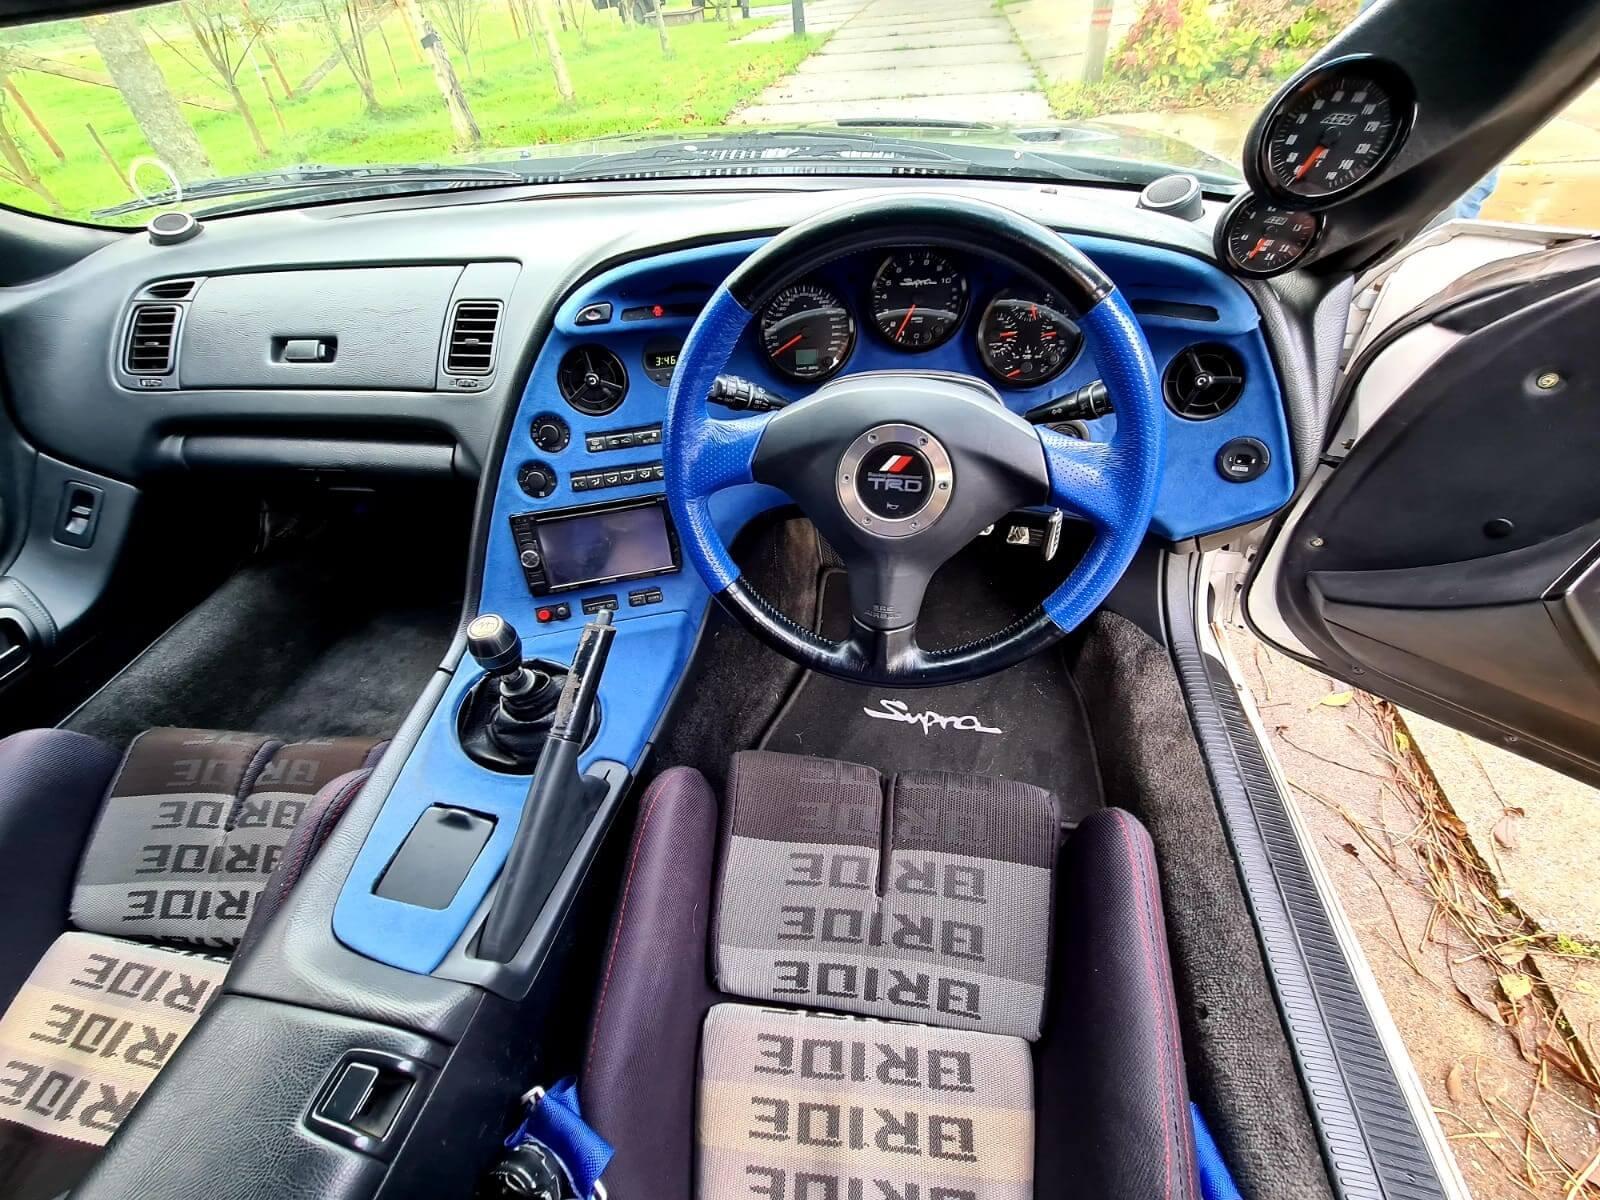 Toyota Supra Big Single turbo 950HP 9